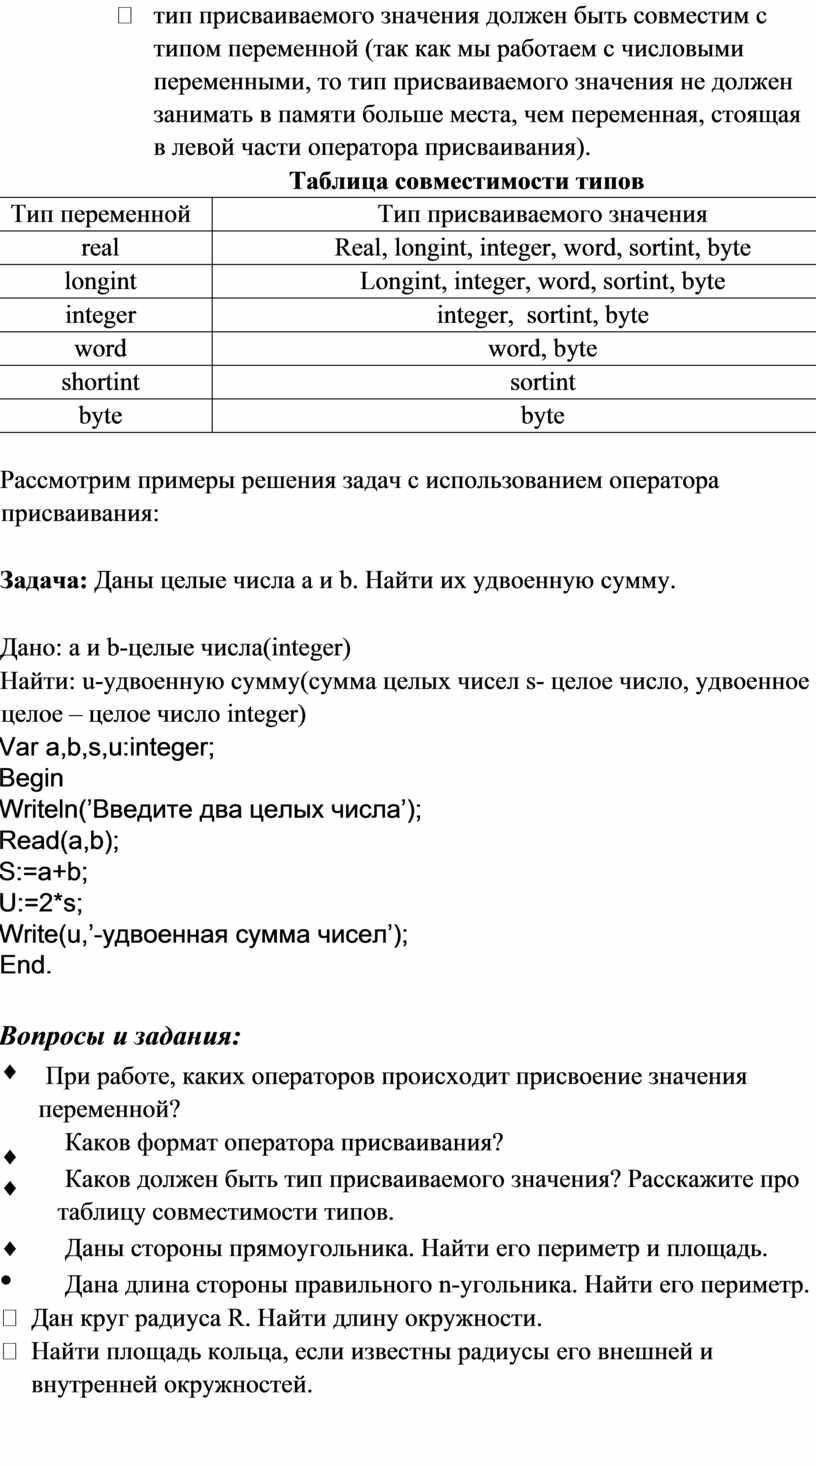 Таблица совместимости типов